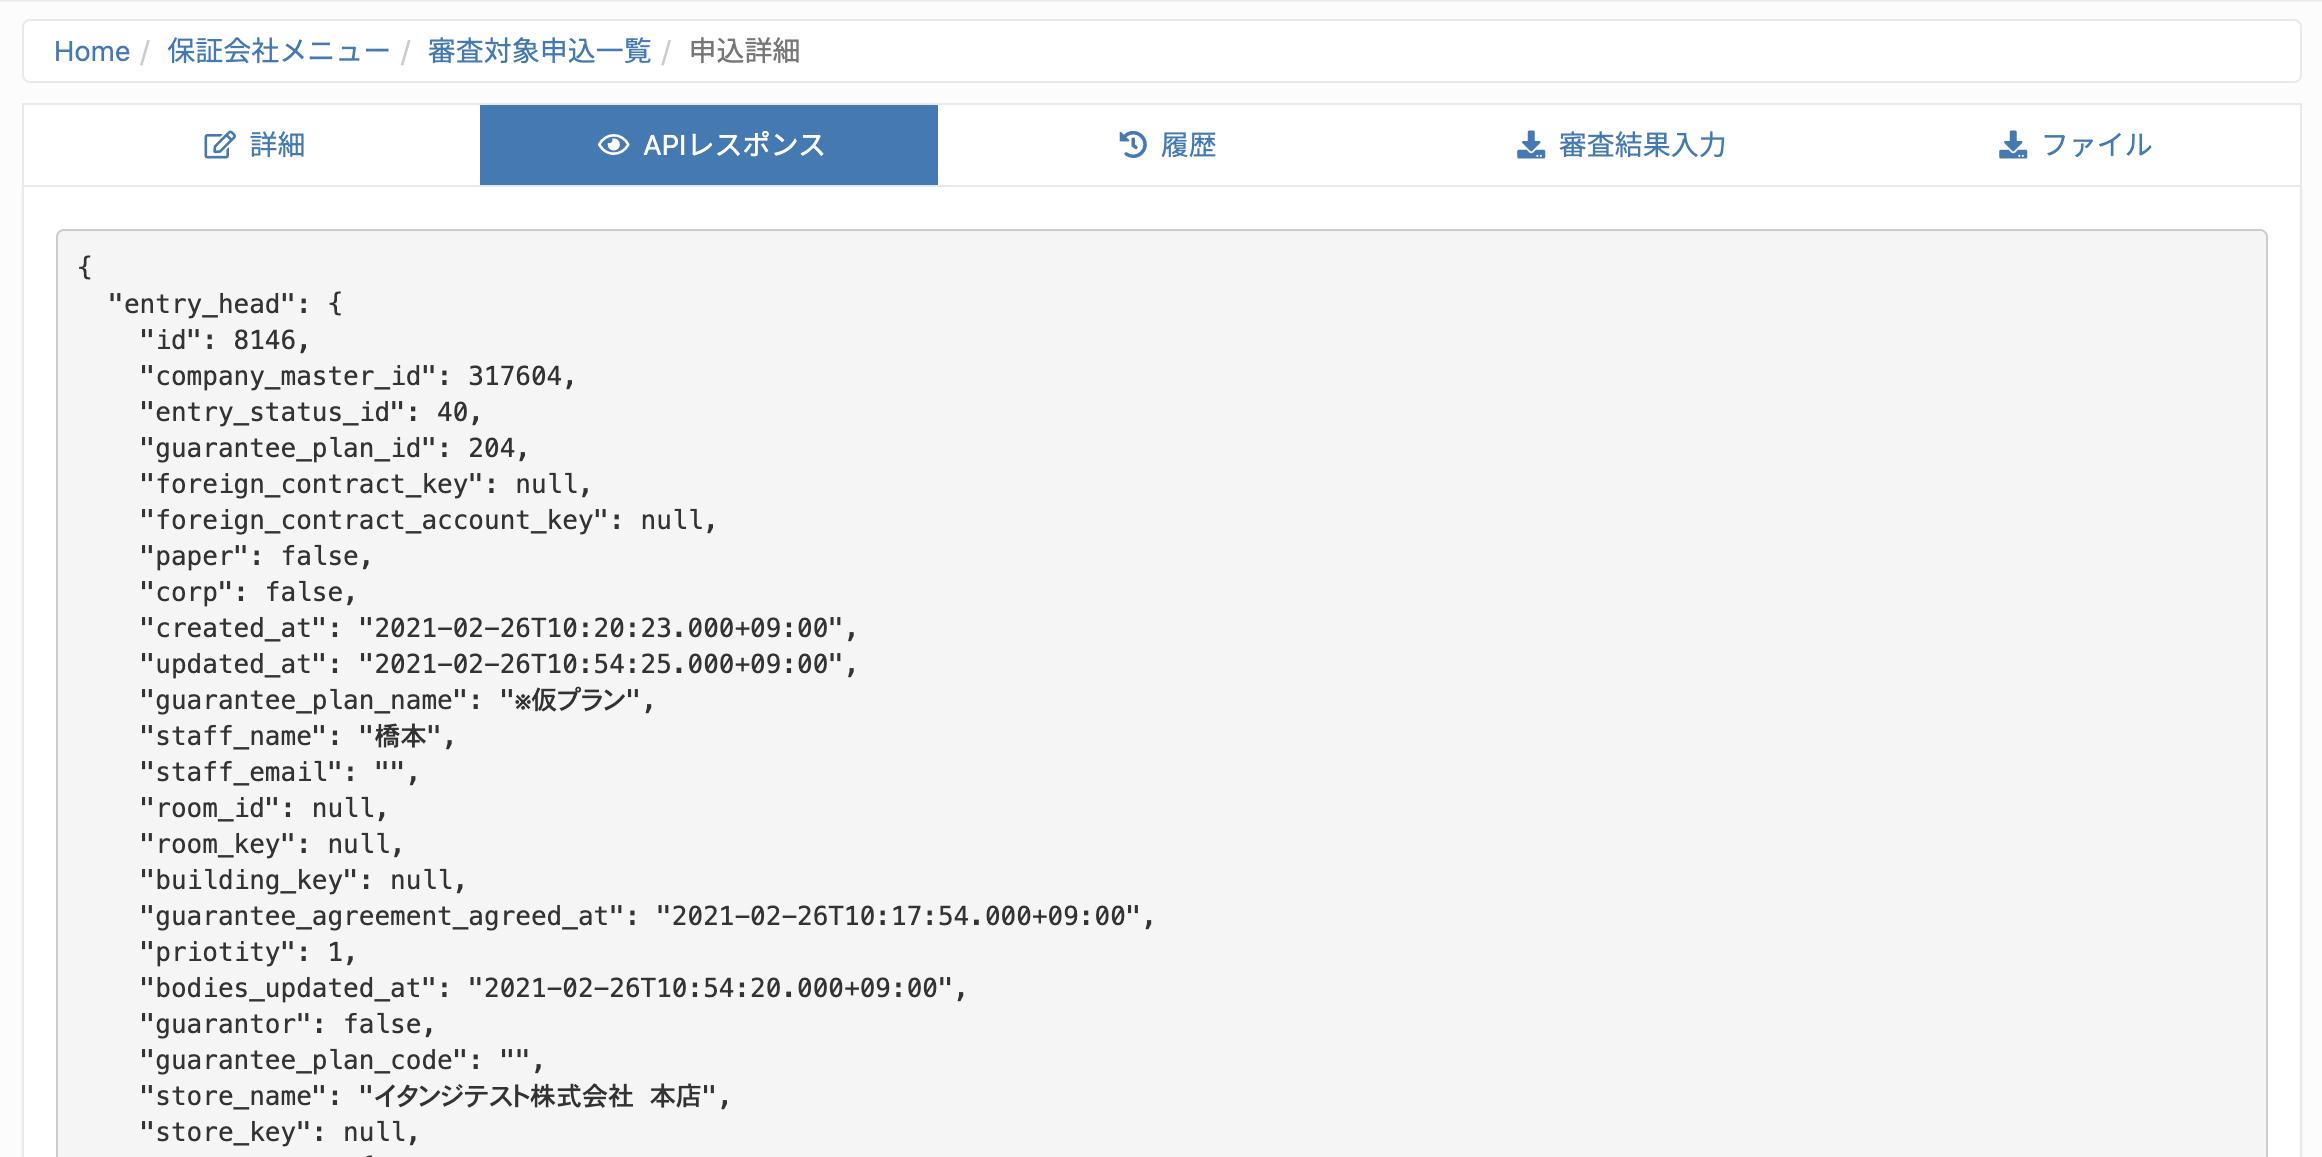 api_response.png (239.5 kB)